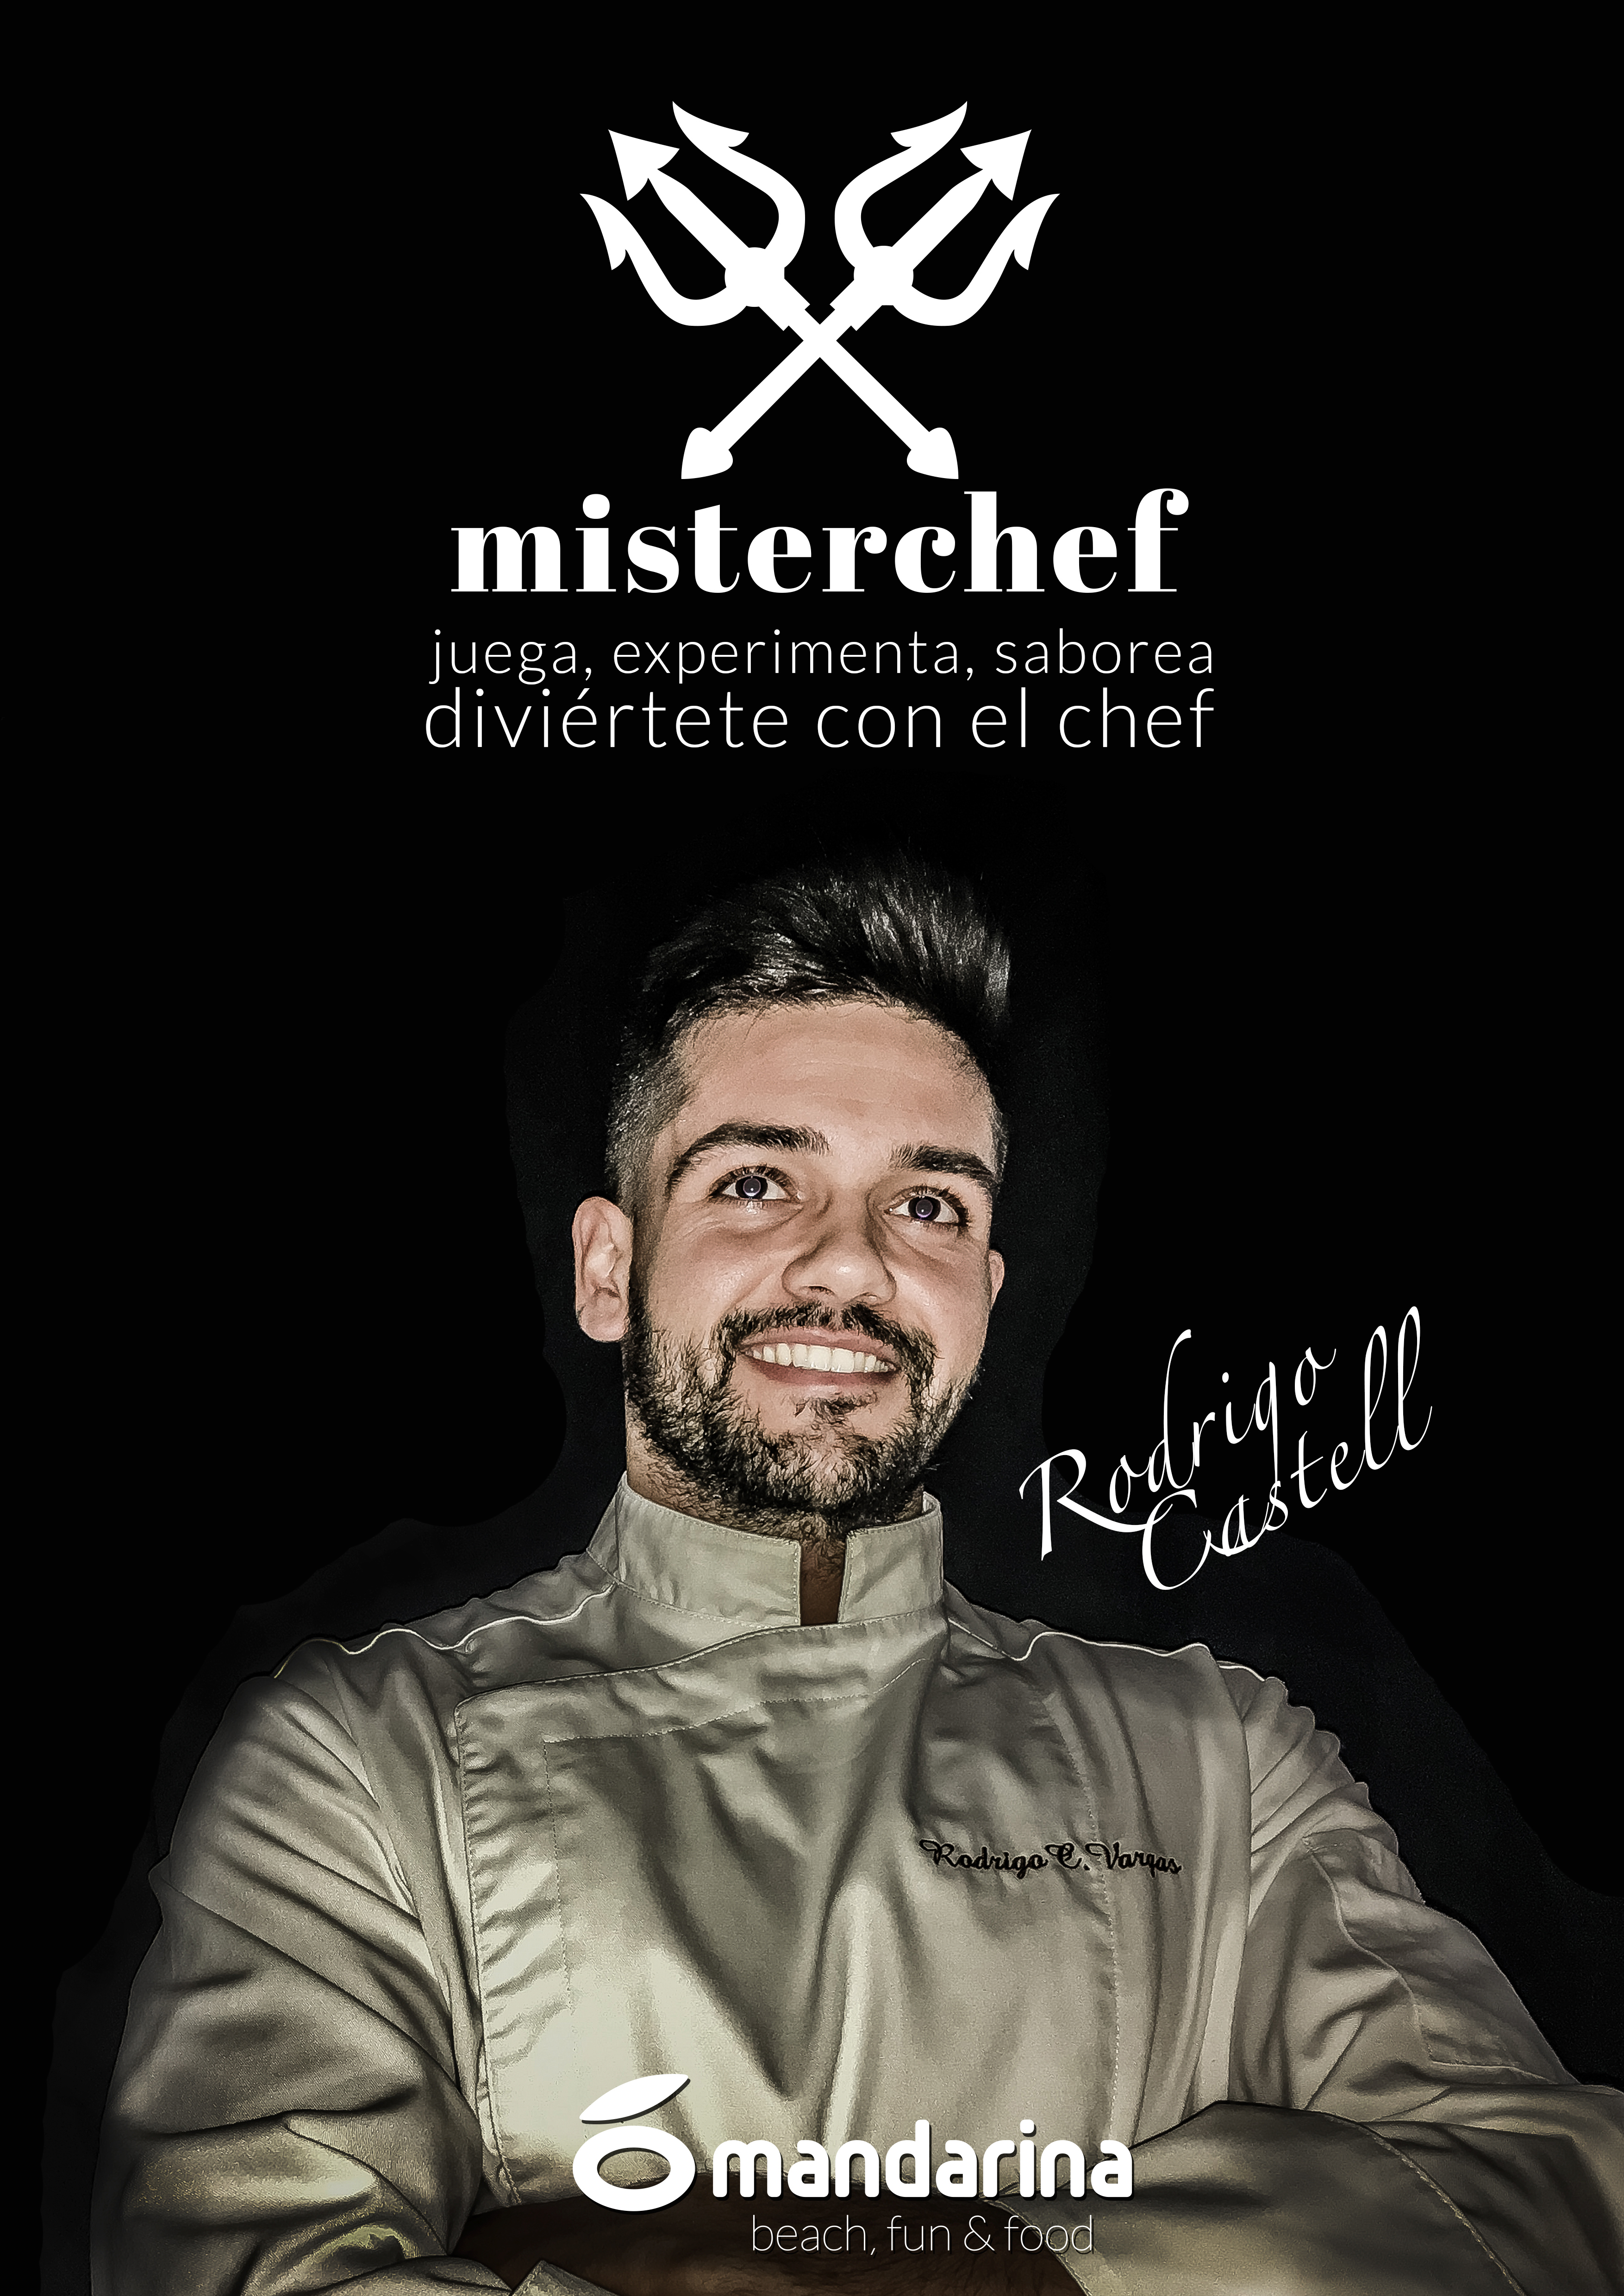 mister chef | Euro Palace Casino Blog